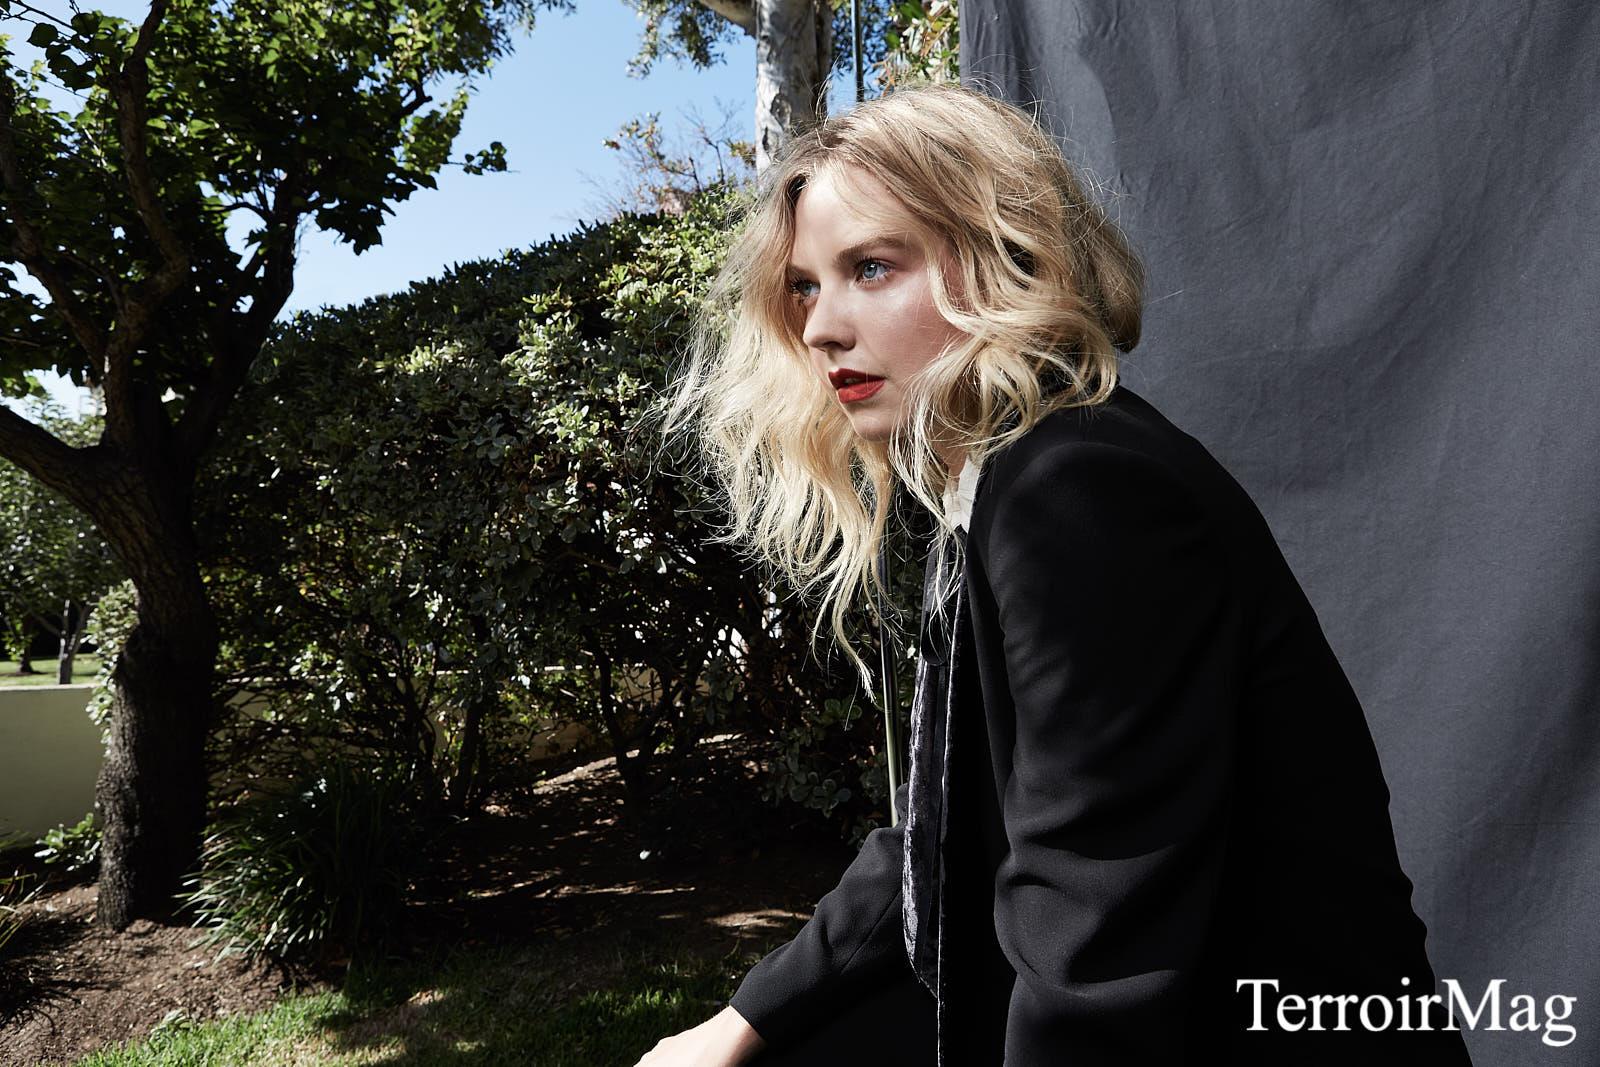 Suit: Pinko  Shirt: Zara Earrings: Caterina Jewelry  Heels: Topshop